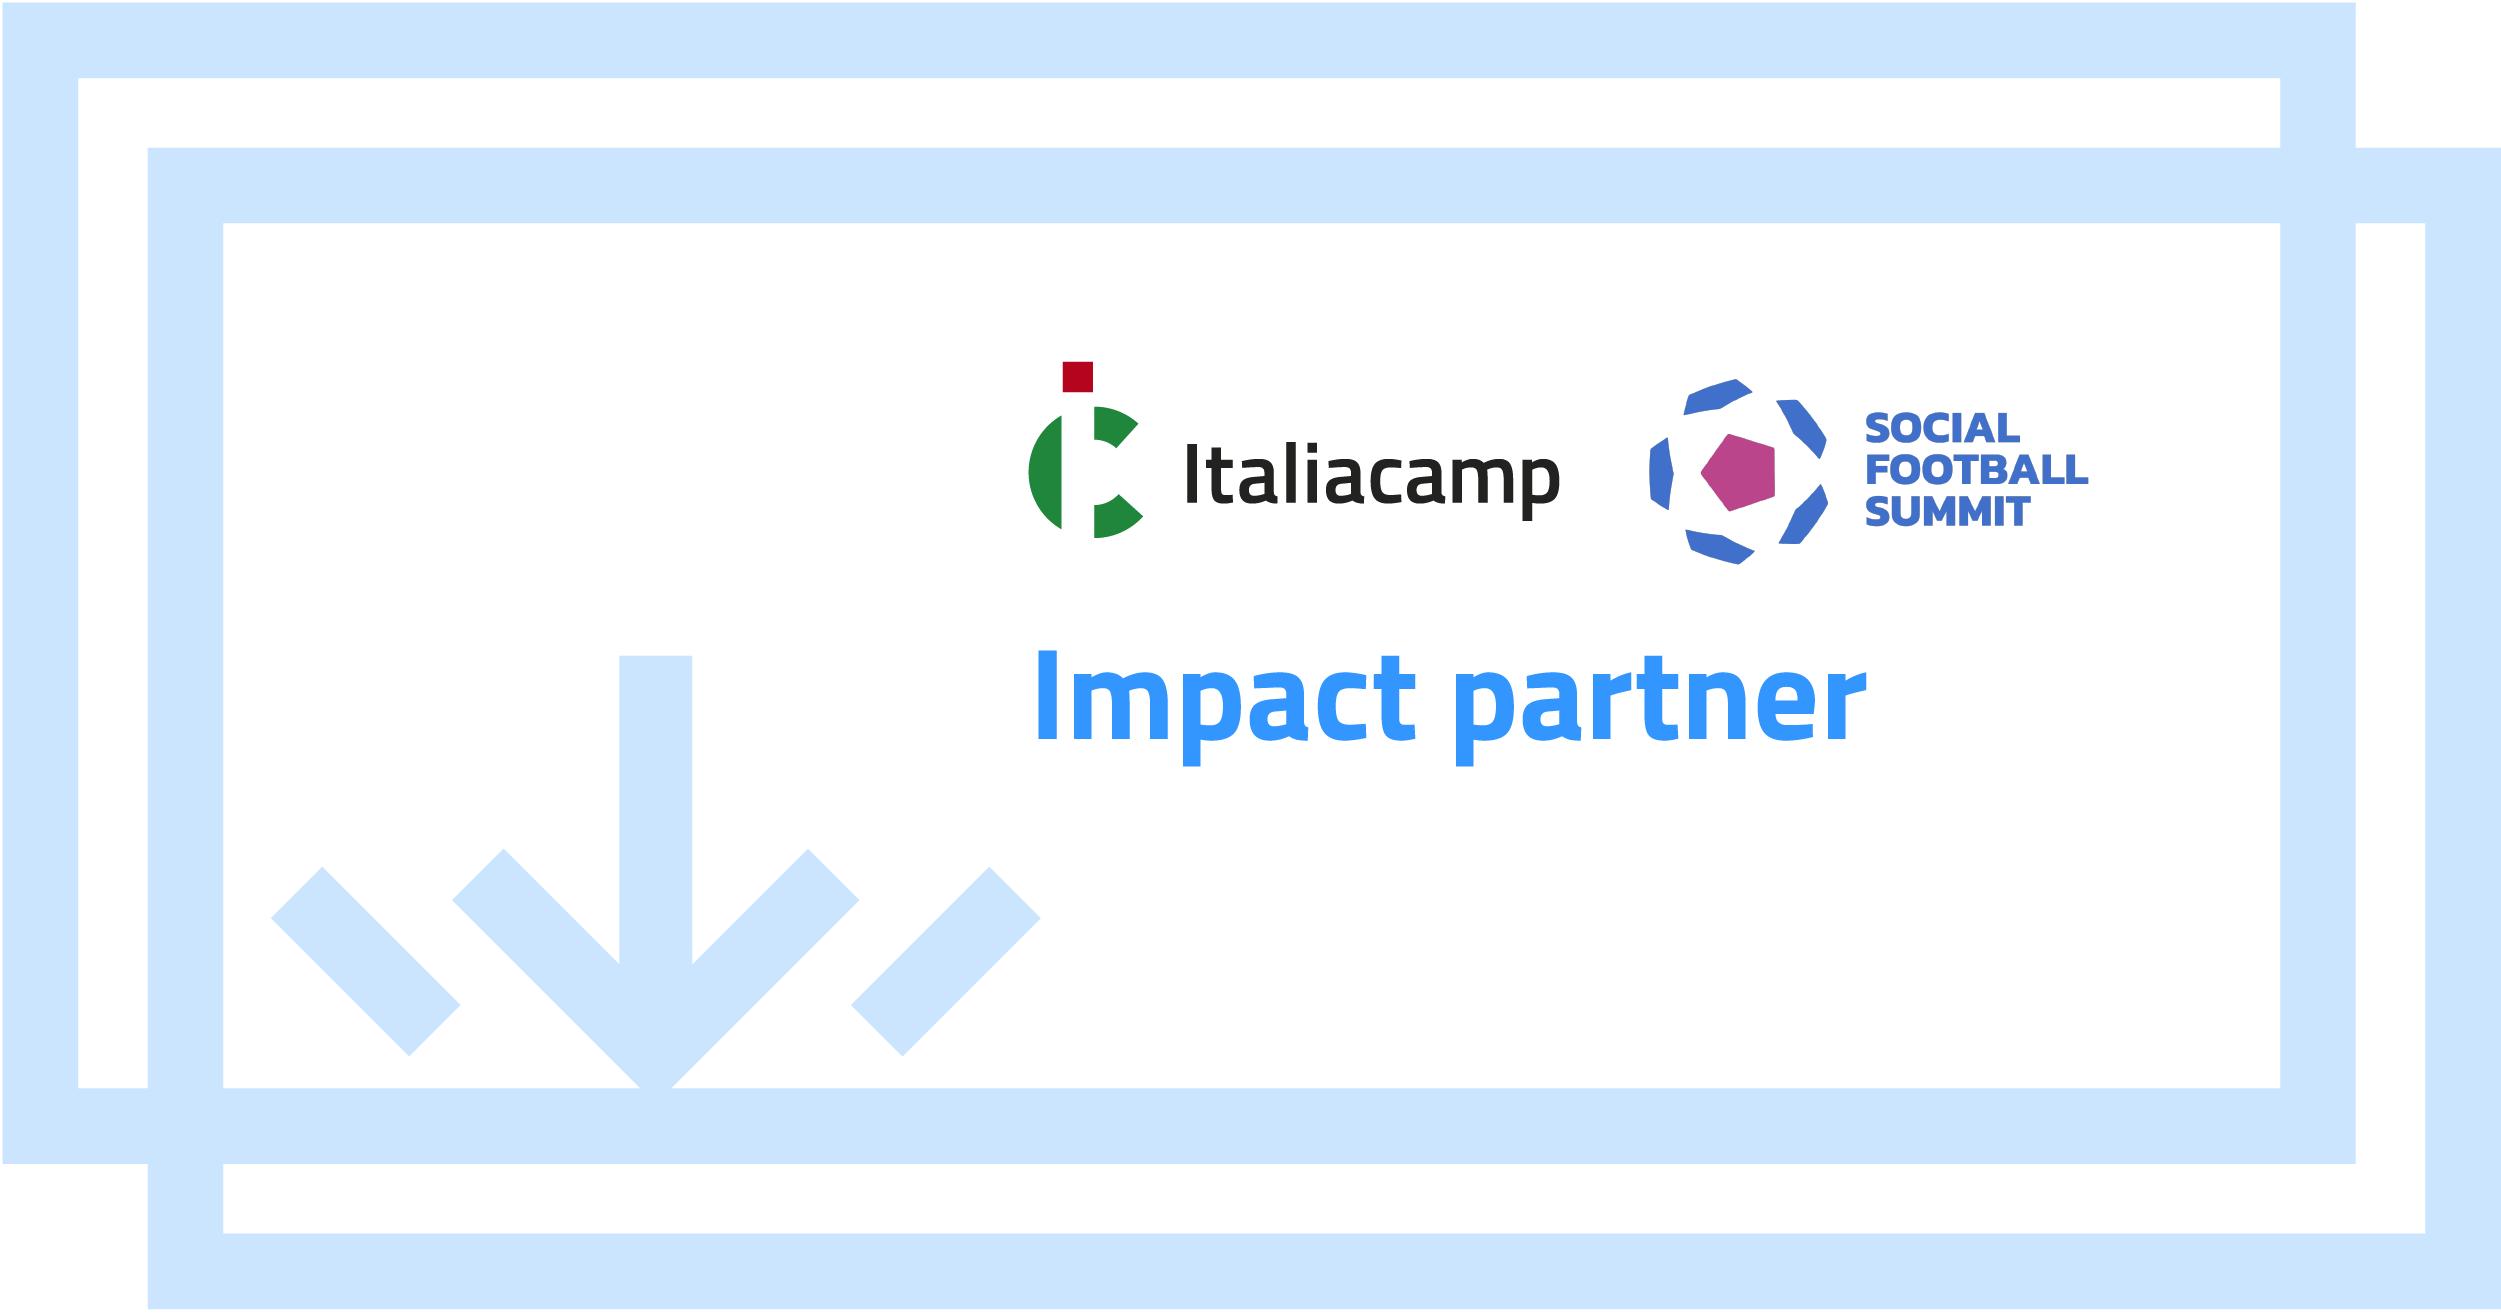 Italiacamp social football summit